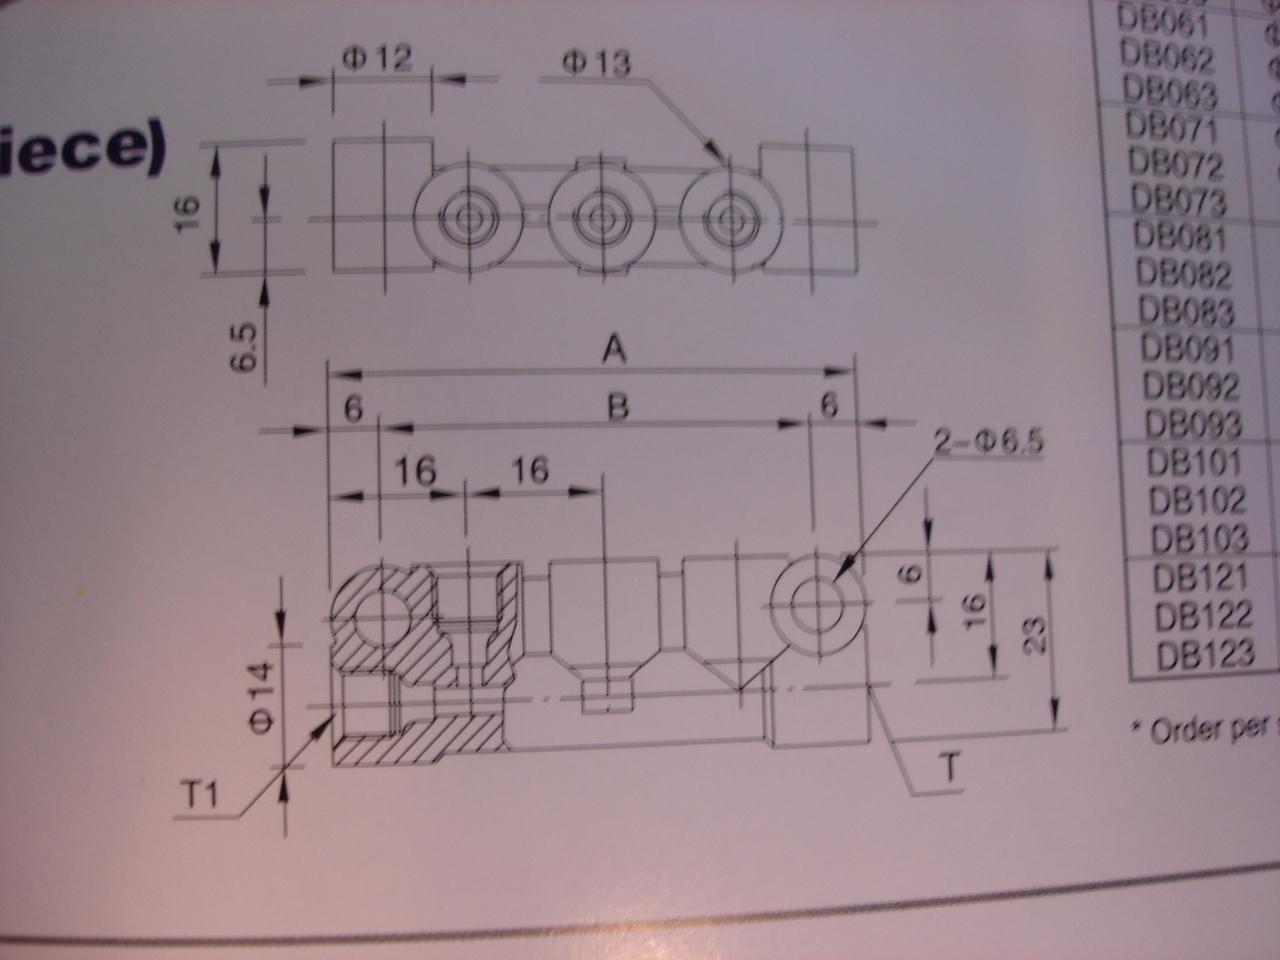 DB Oil Distributor A-4